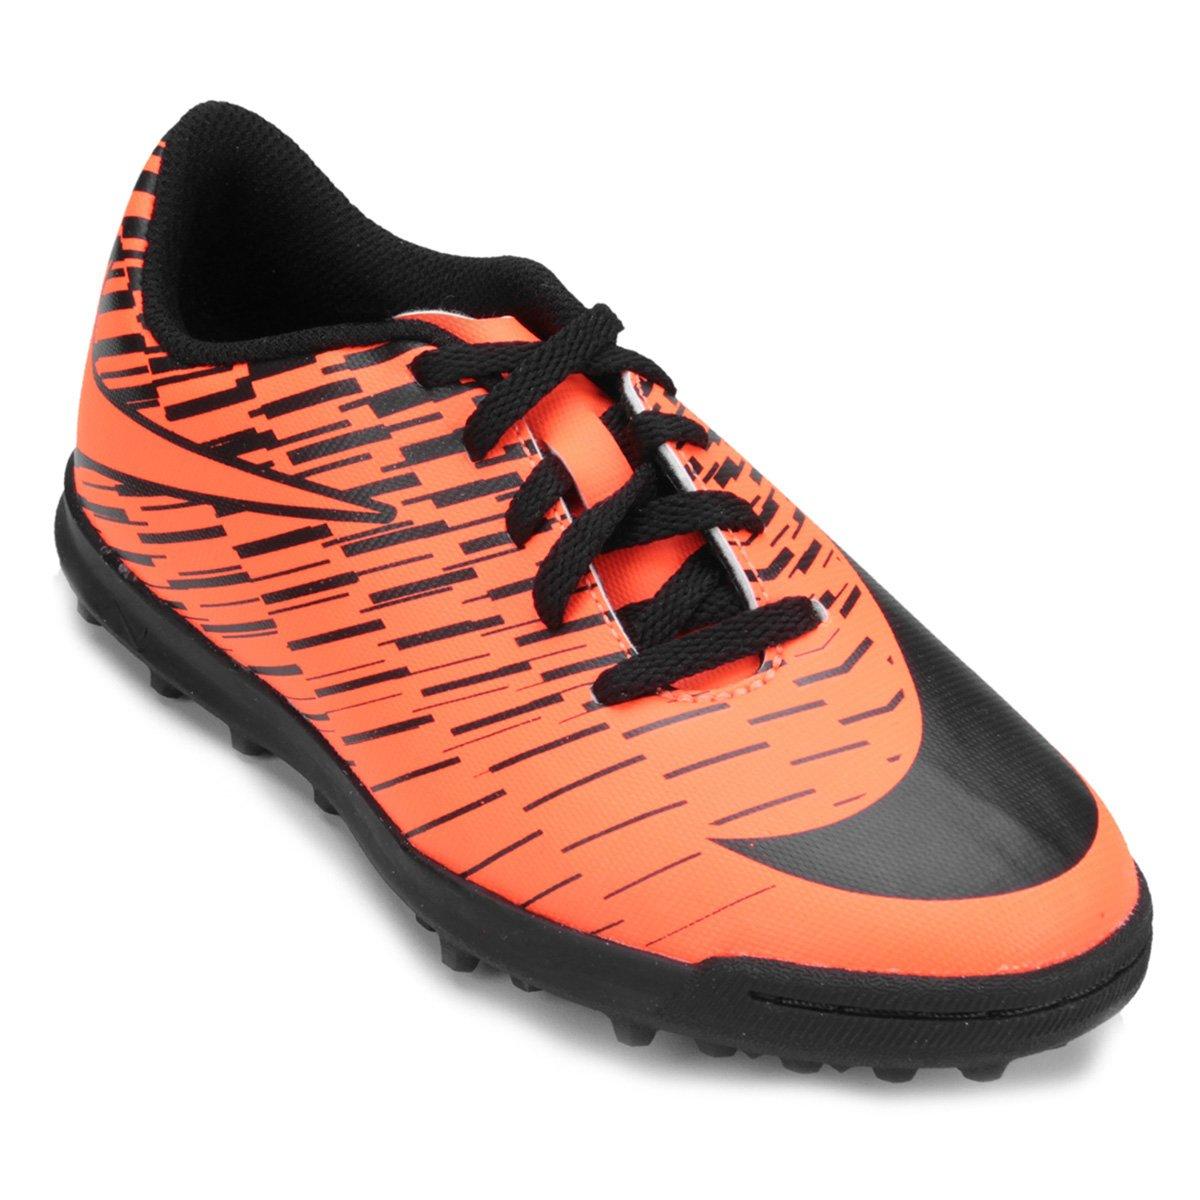 d083a0ad36 Chuteira Society Infantil Nike Bravata 2 TF - Preto e Laranja Escuro ...